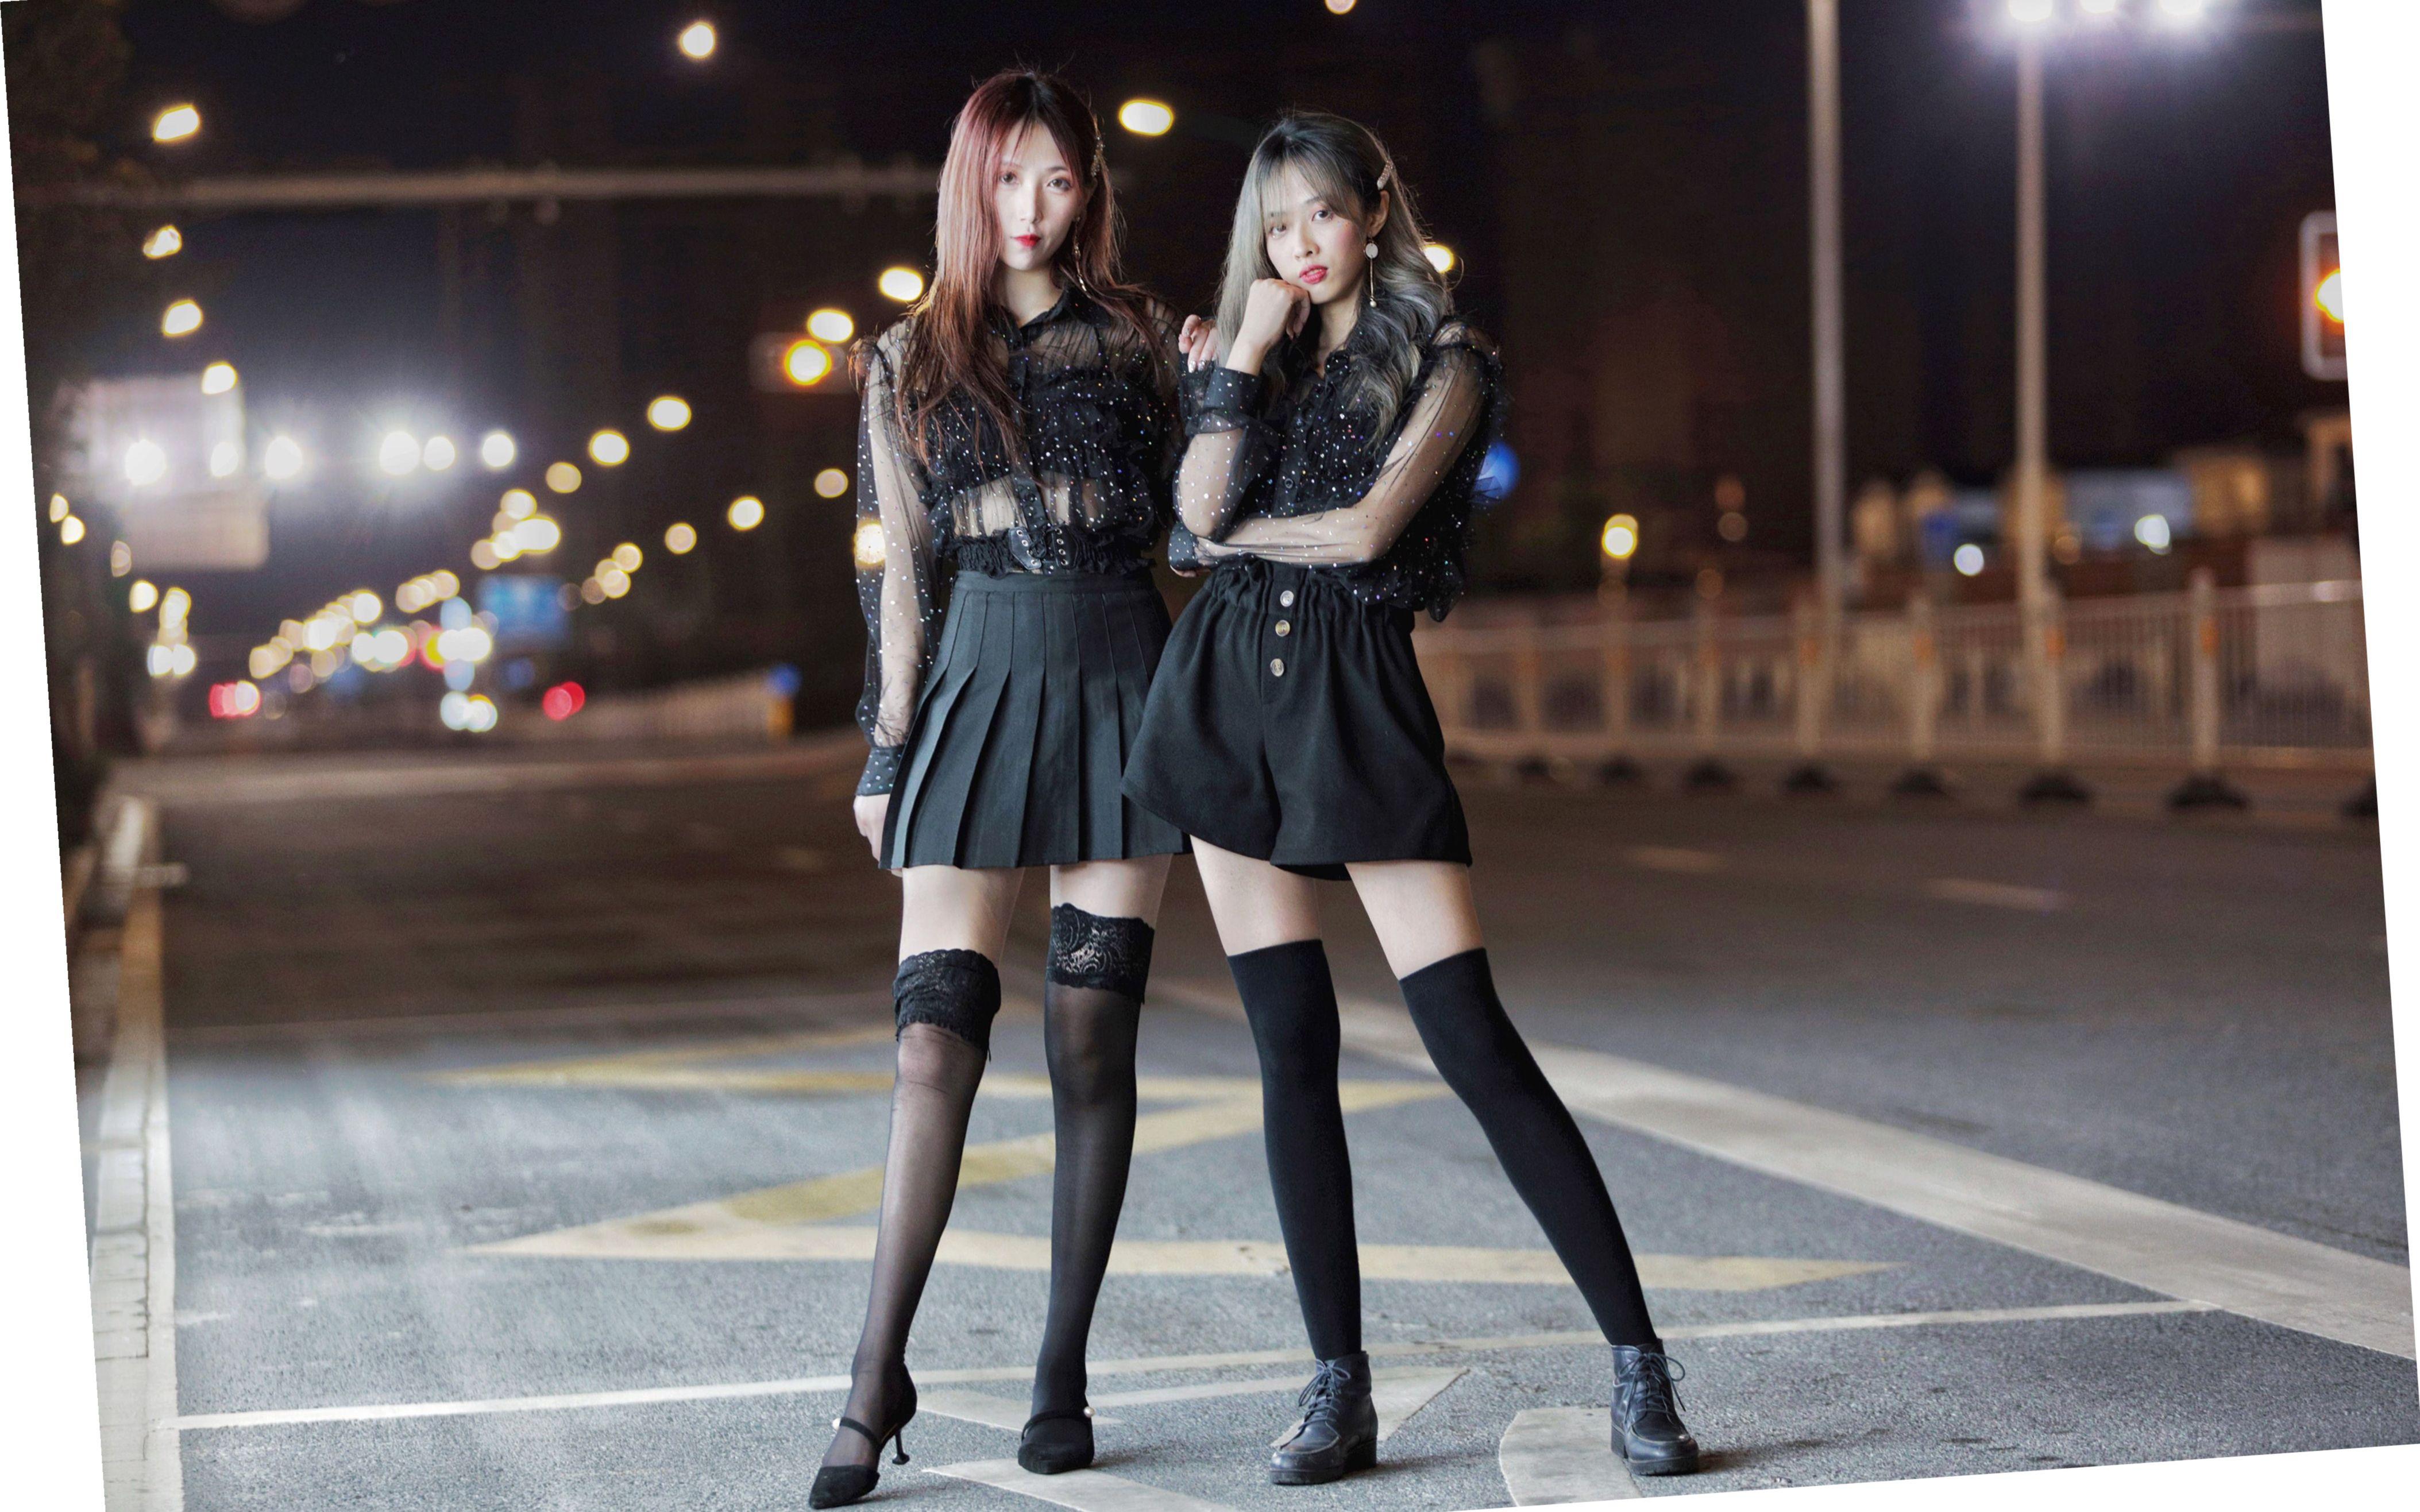 【Natsu夏日 x 小妍】Gfriend - 夜 Time for the moon night【此夜梦中,与你相见。】